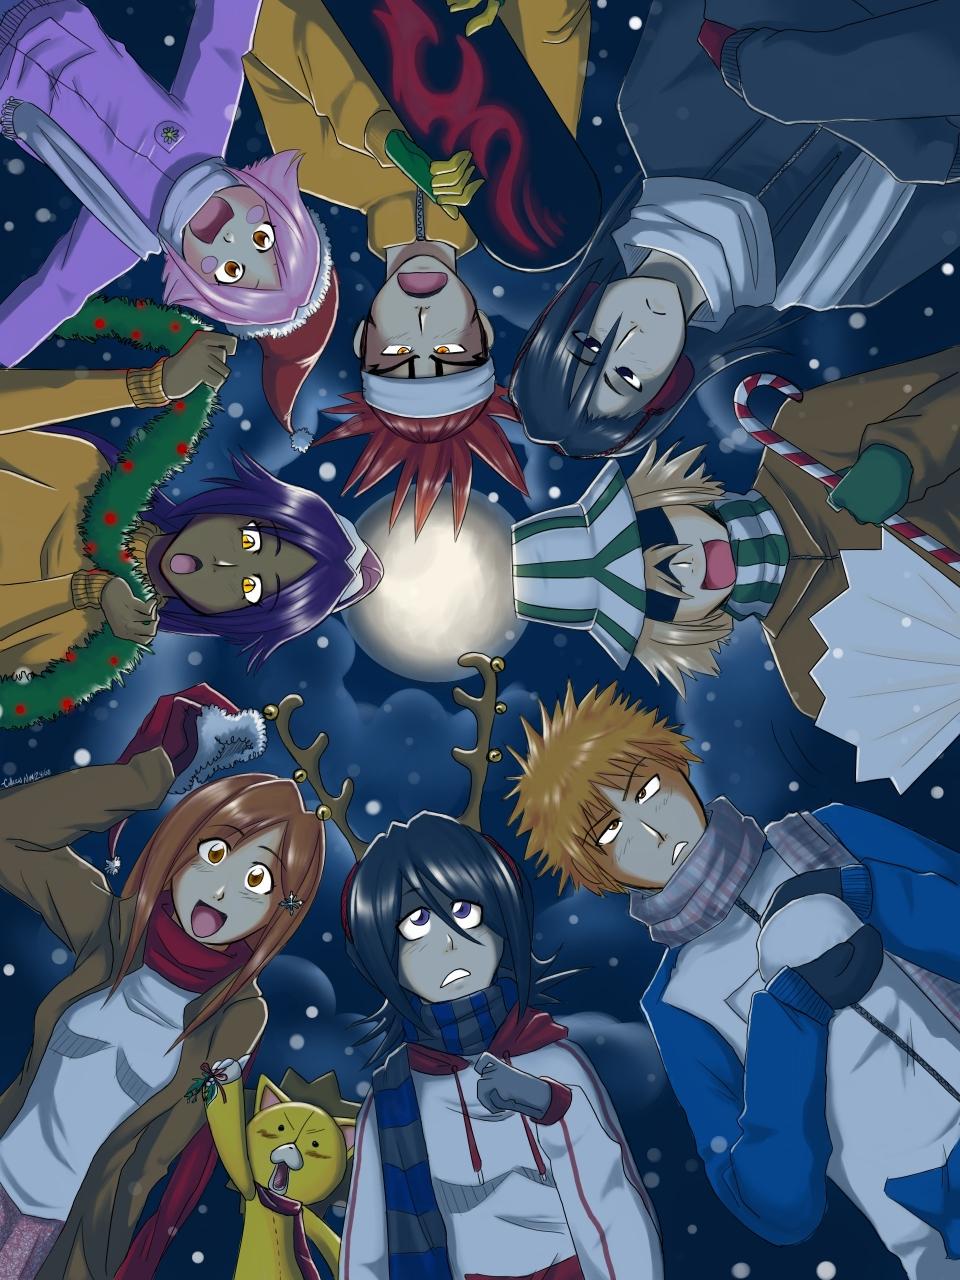 Rukia and ichigo - 2 part 5